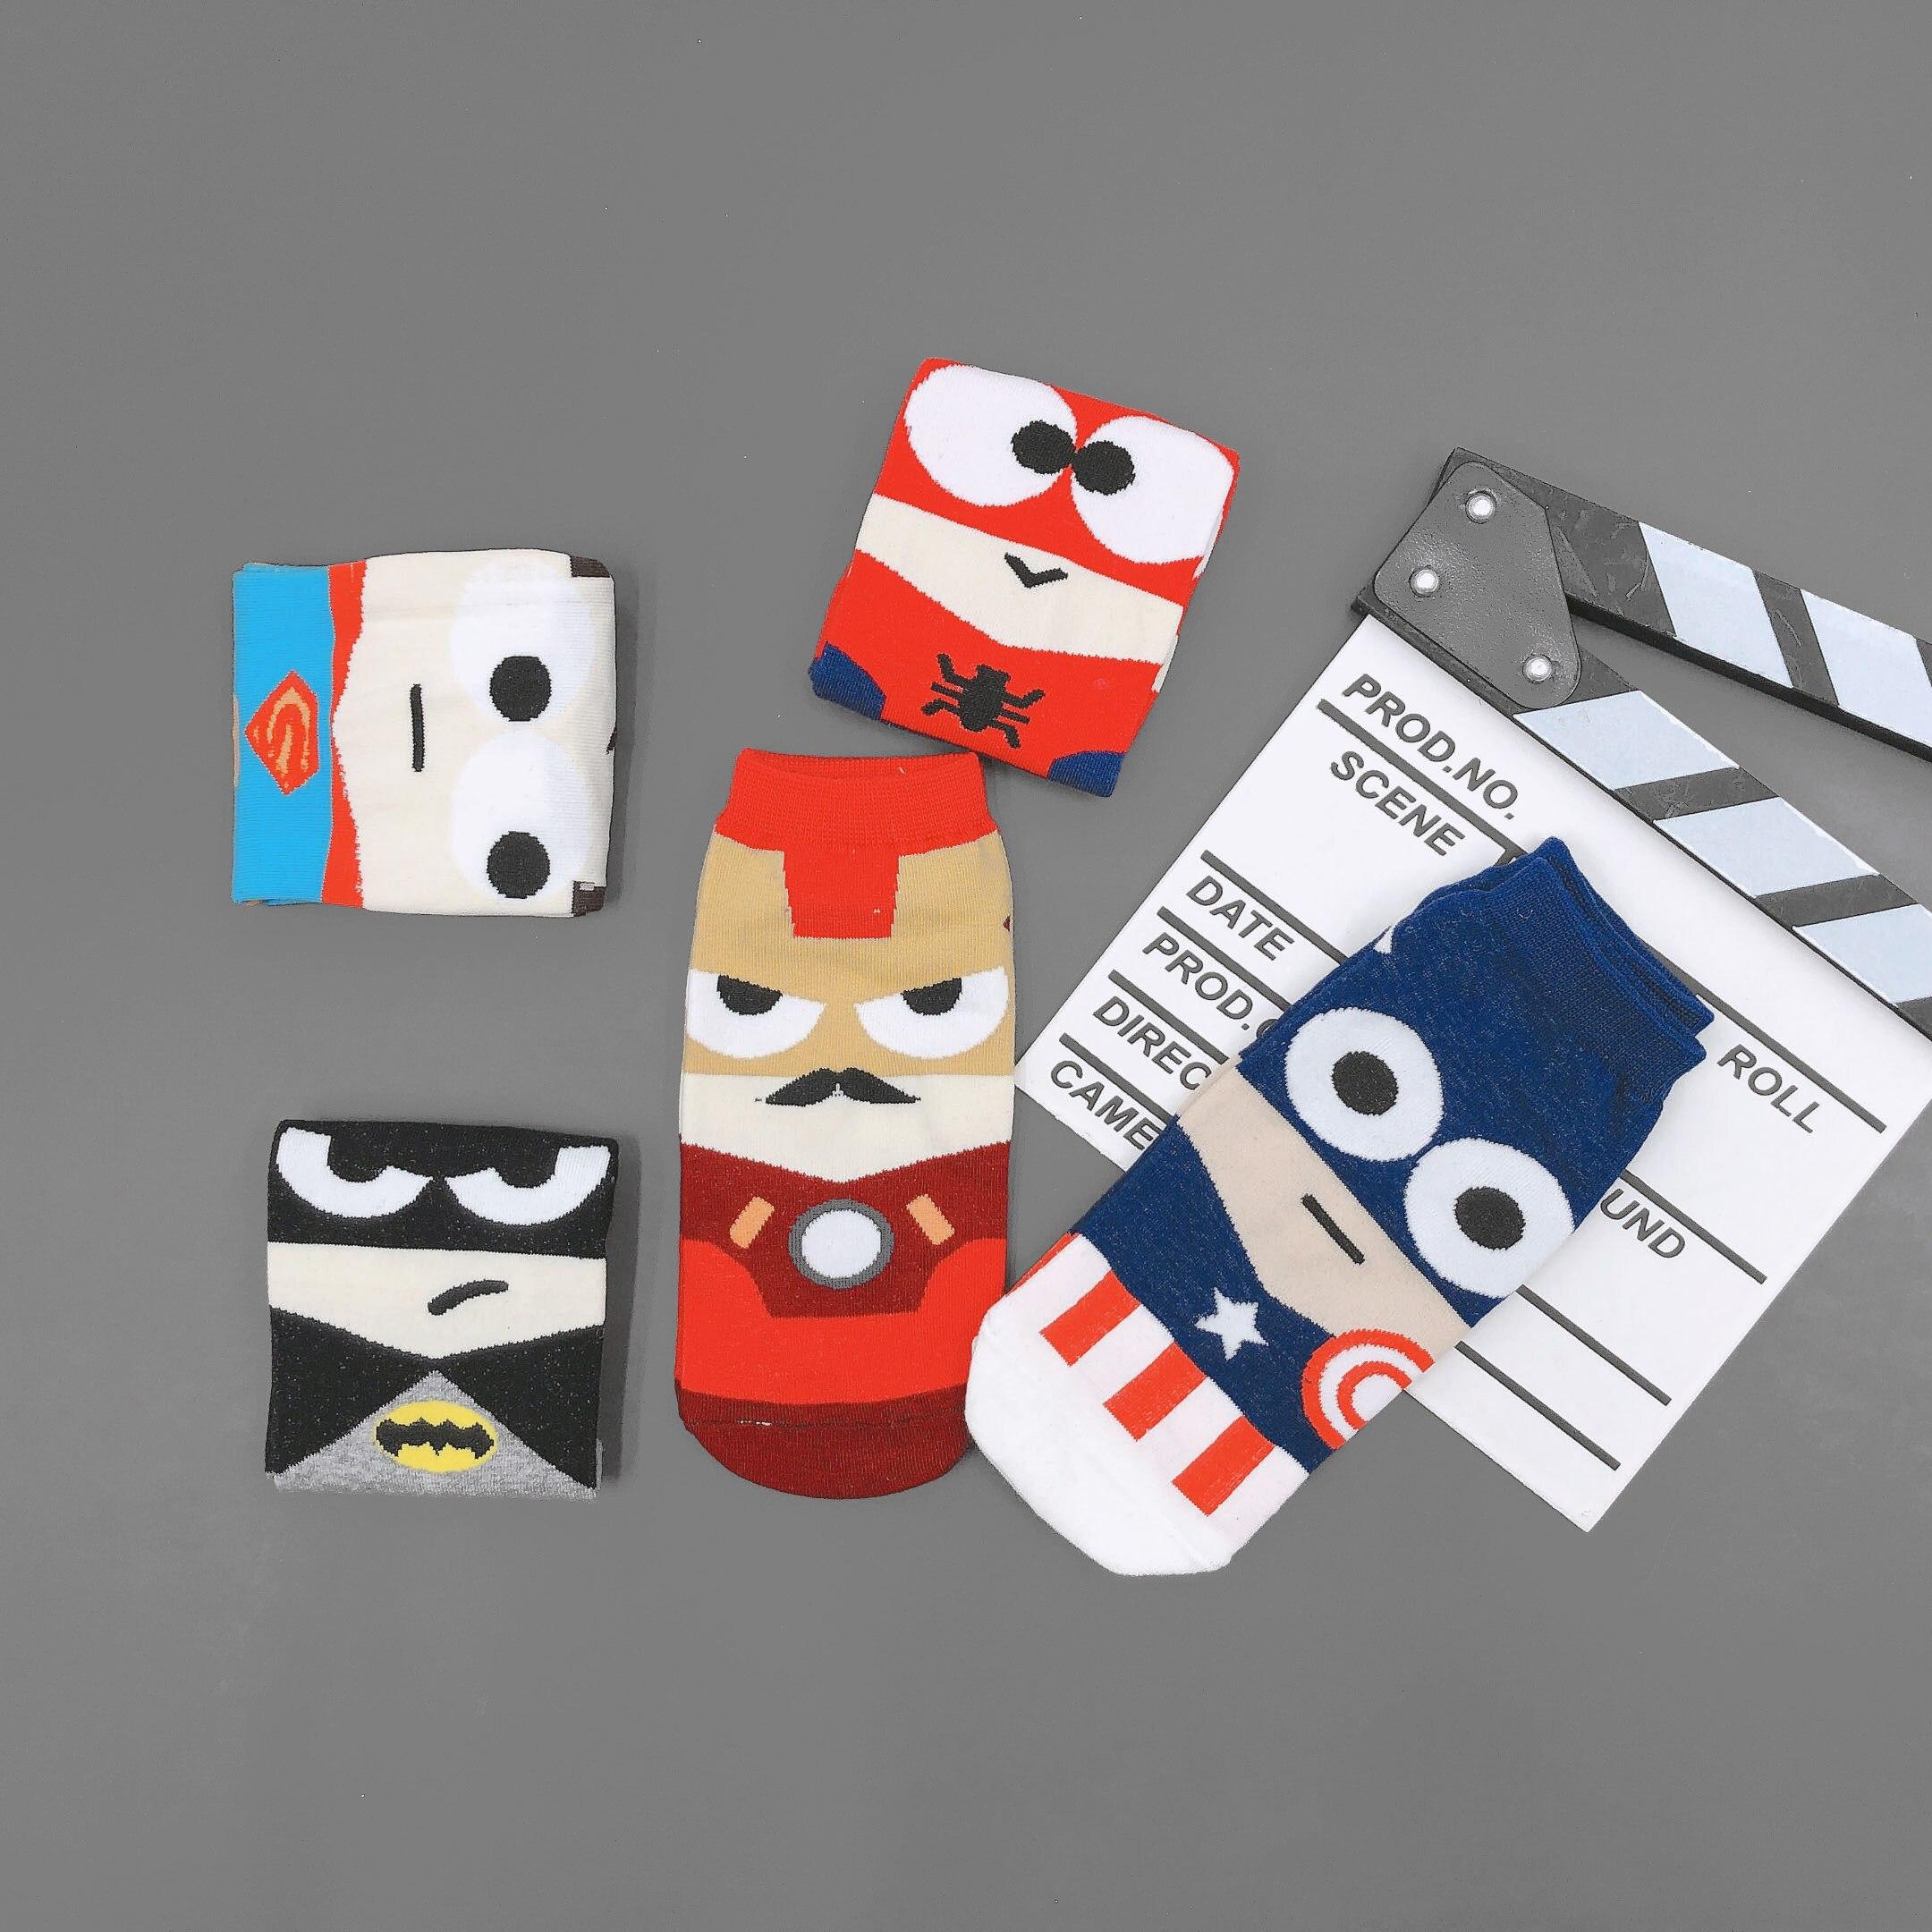 Men Socks Marvel Superman Spiderman Batman Captain America Iron Man Cartoon Cute Cool Funny Colorful Happy Short Socks